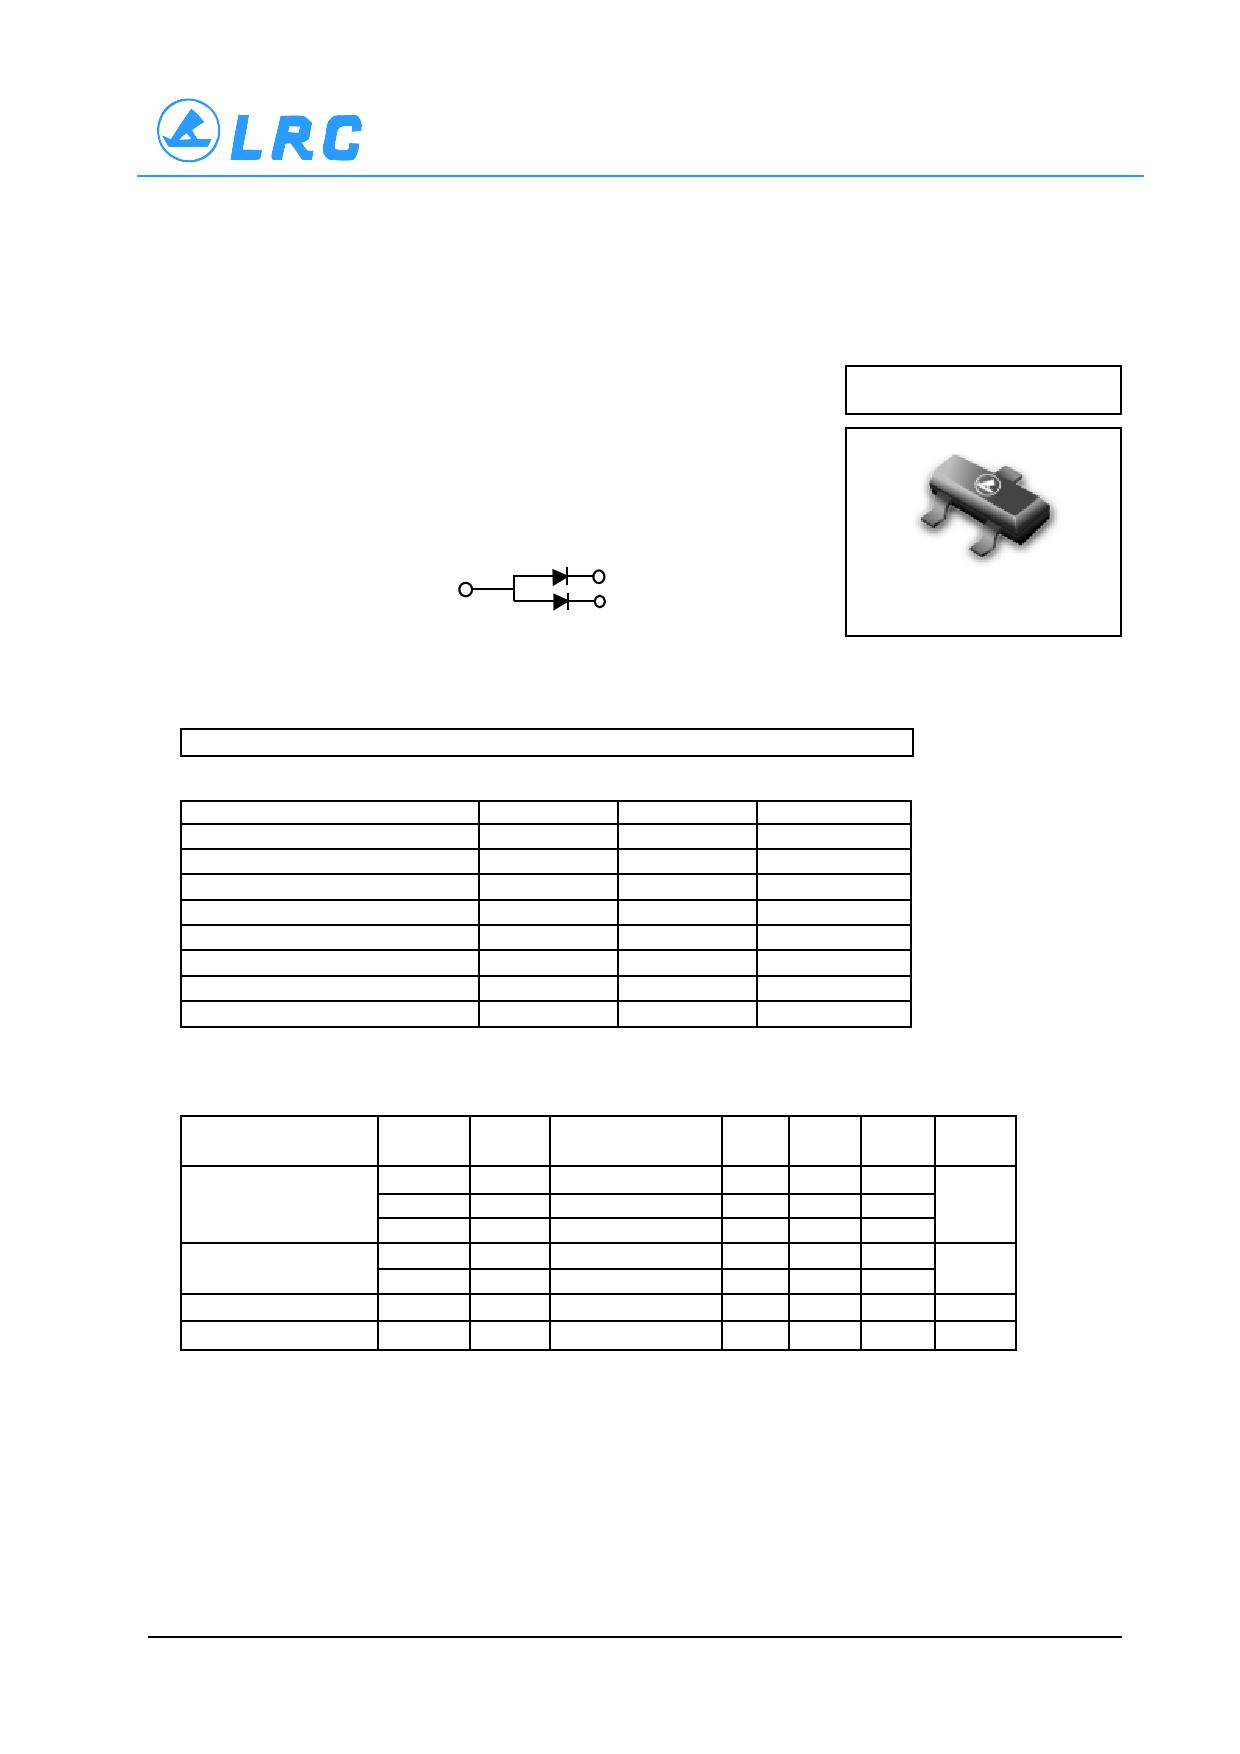 L1SS181LT1 datasheet